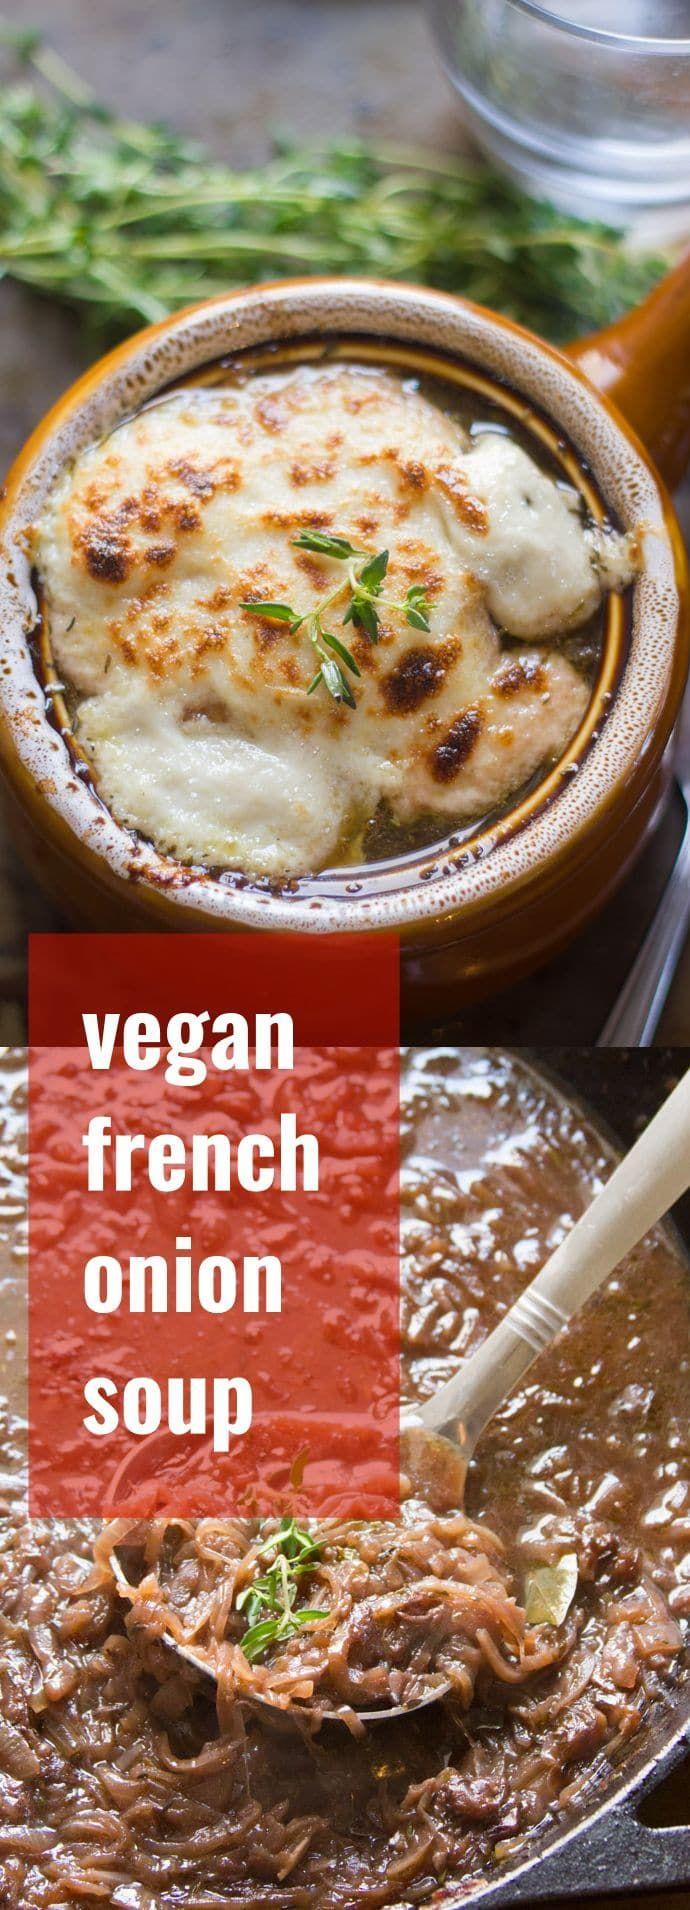 Vegan French Onion Soup Vegan French Onion Soup Onion Soup Recipes Soup Recipes